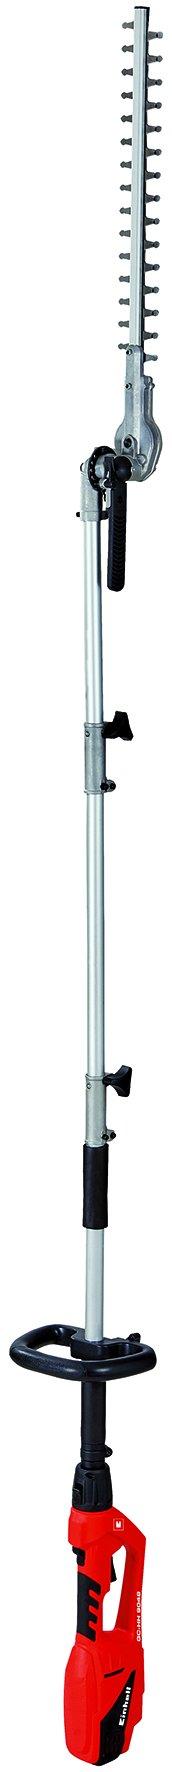 Einhell GC-HH 9048 Pole Trimmer   410mm   900 Watt   240 Volt